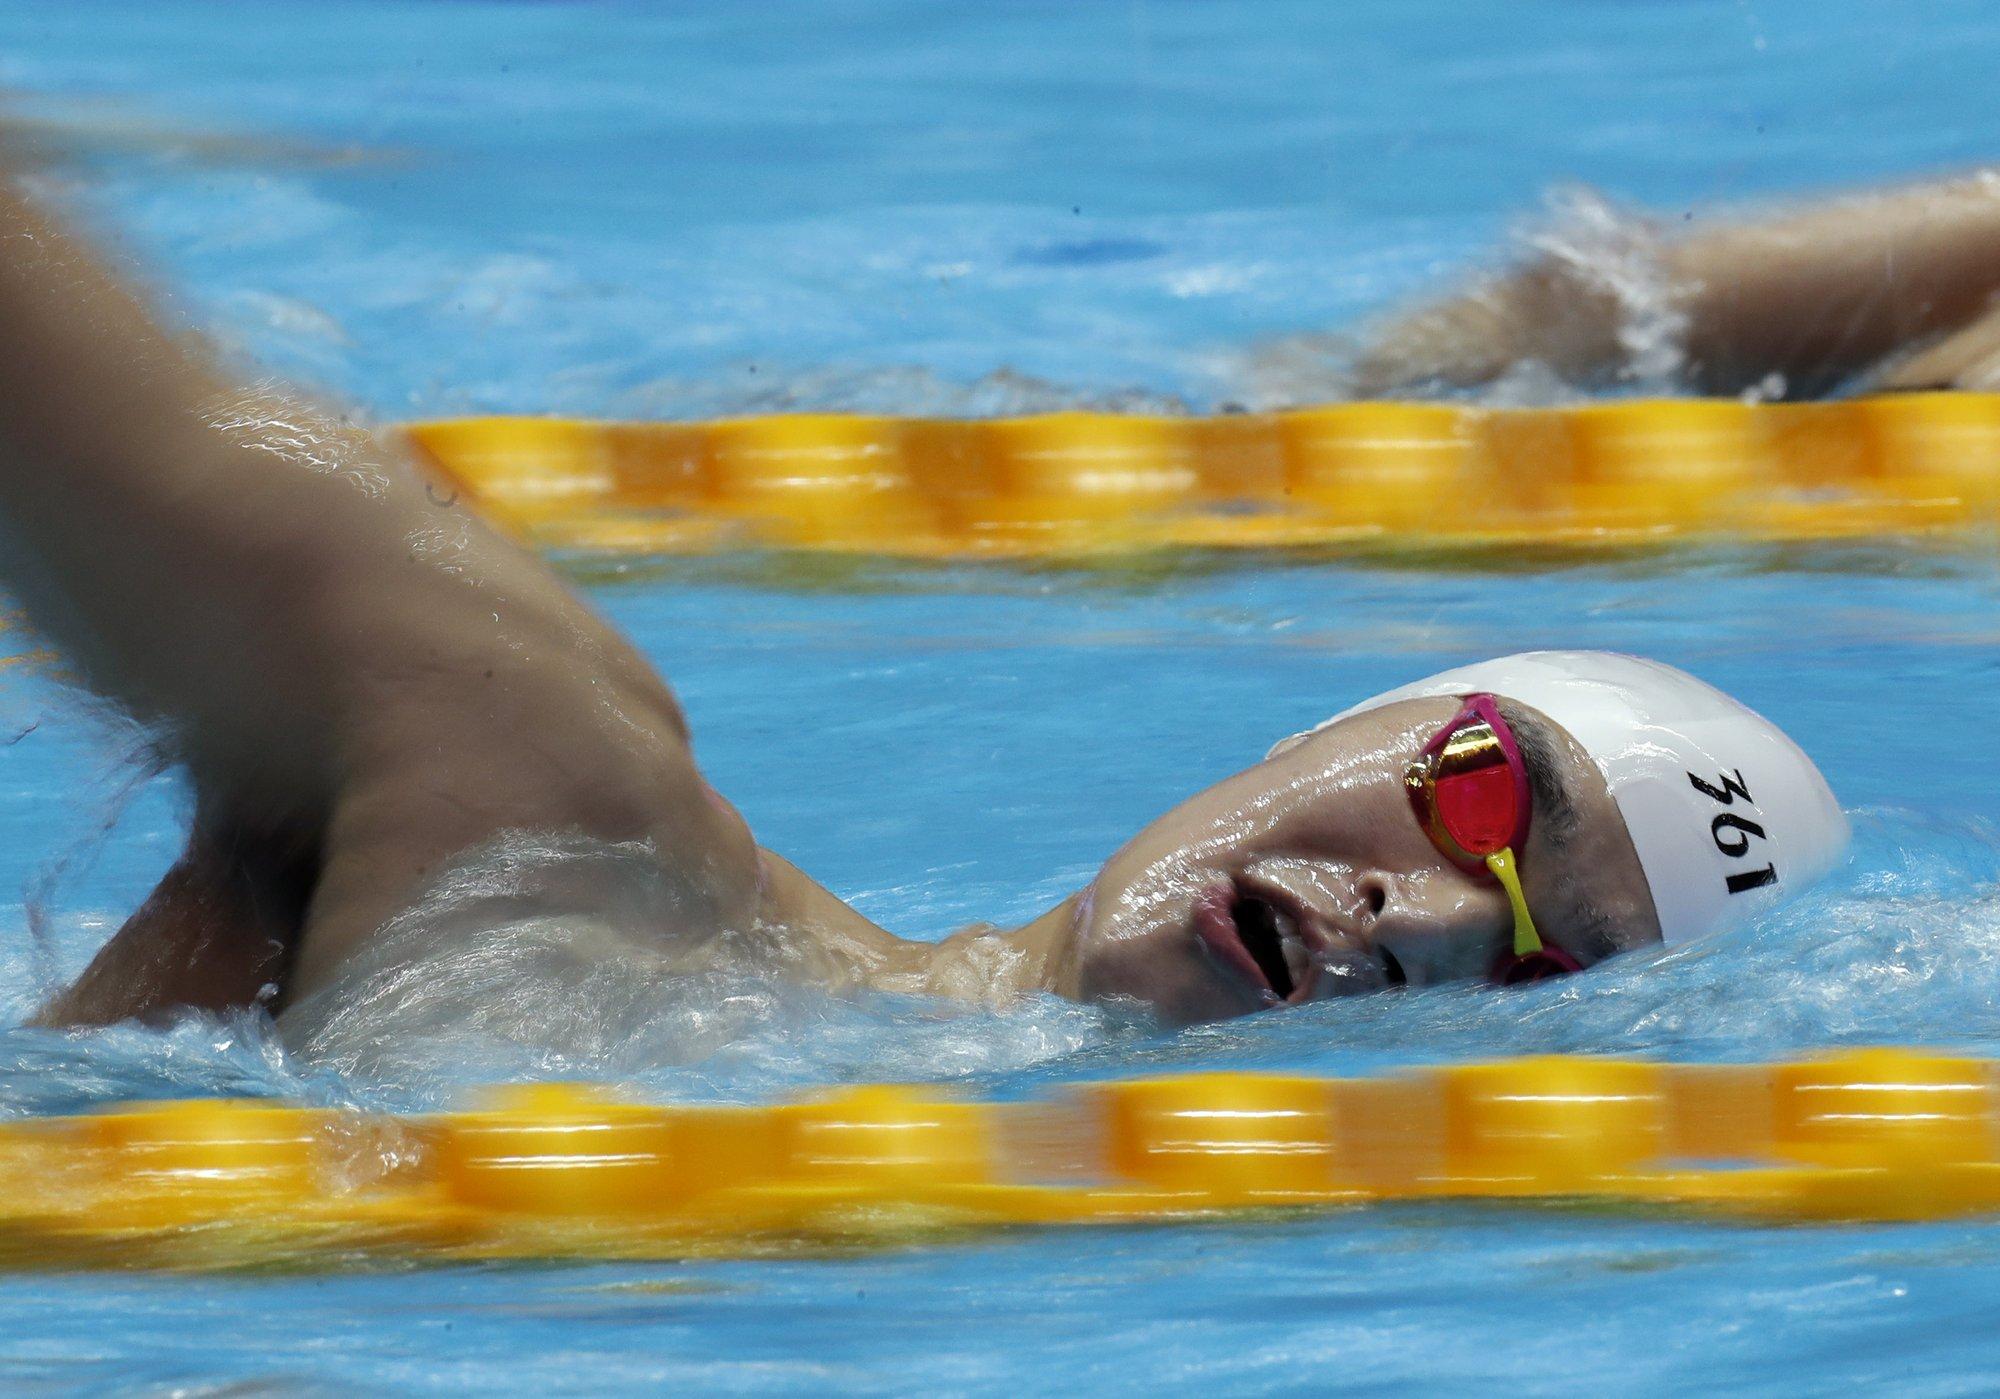 Sun's doping case looms over start of world swimming meet